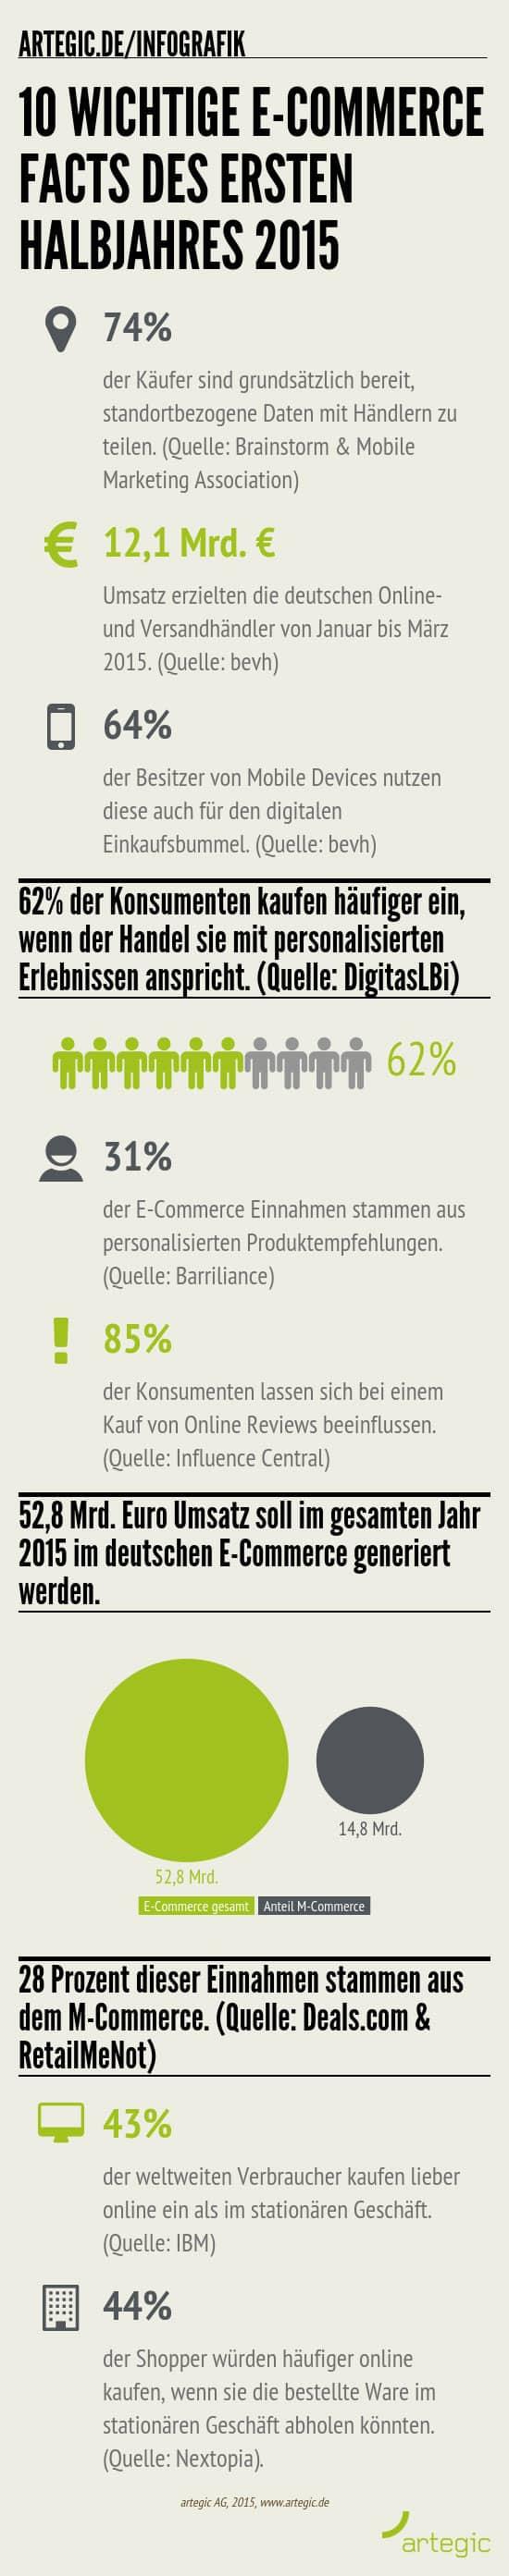 Photo of Infografik: 10 wichtige E-Commerce Facts des ersten Halbjahres 2015